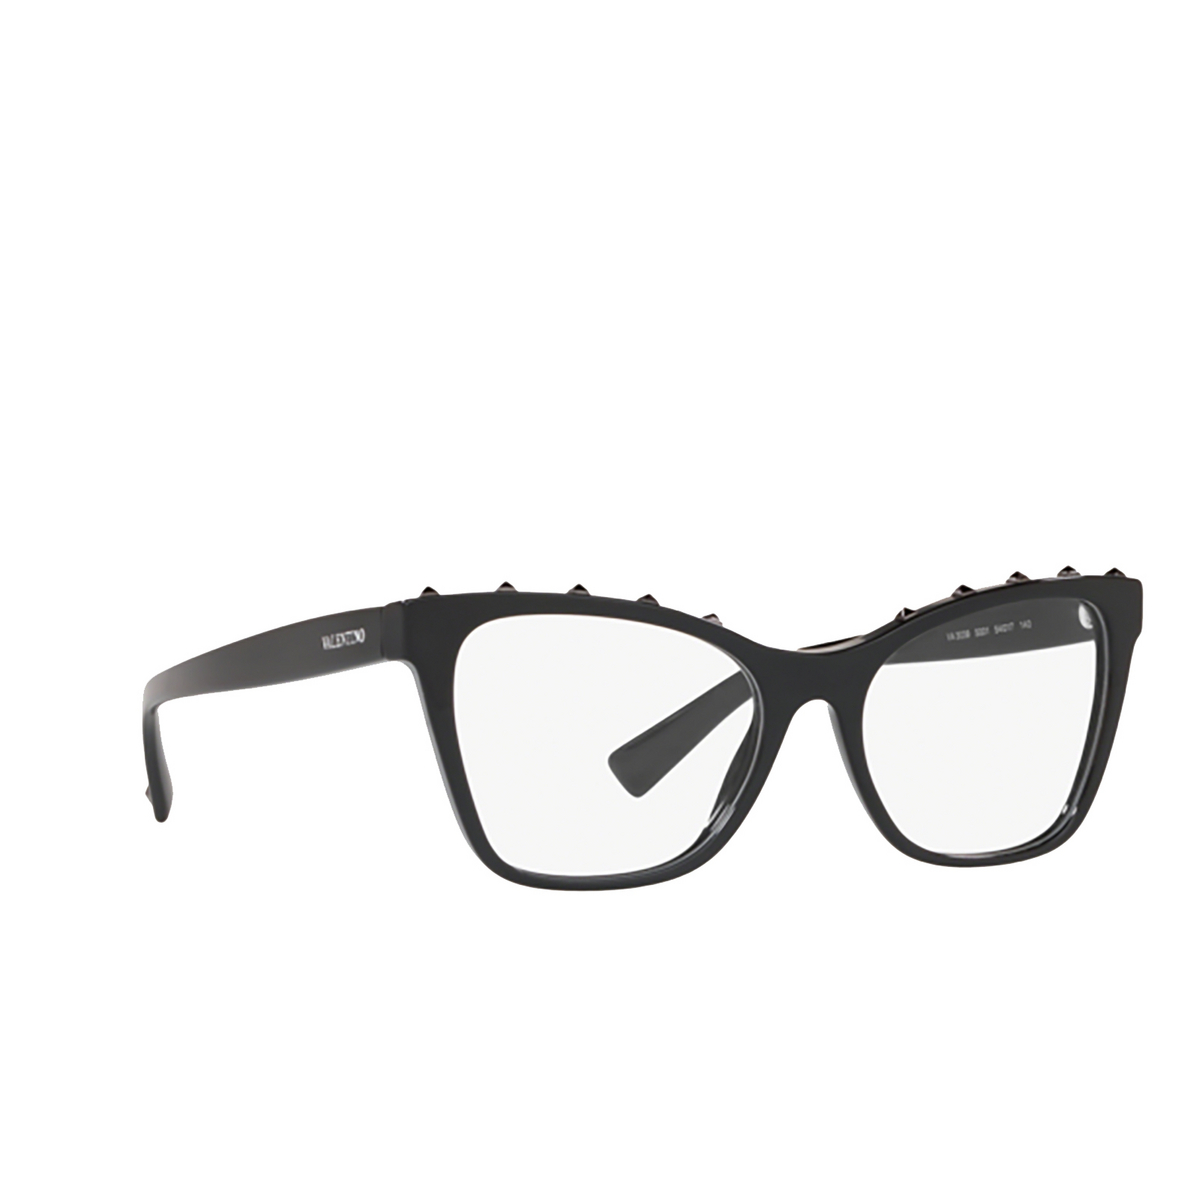 Valentino® Square Eyeglasses: VA3039 color Black 5001 - three-quarters view.